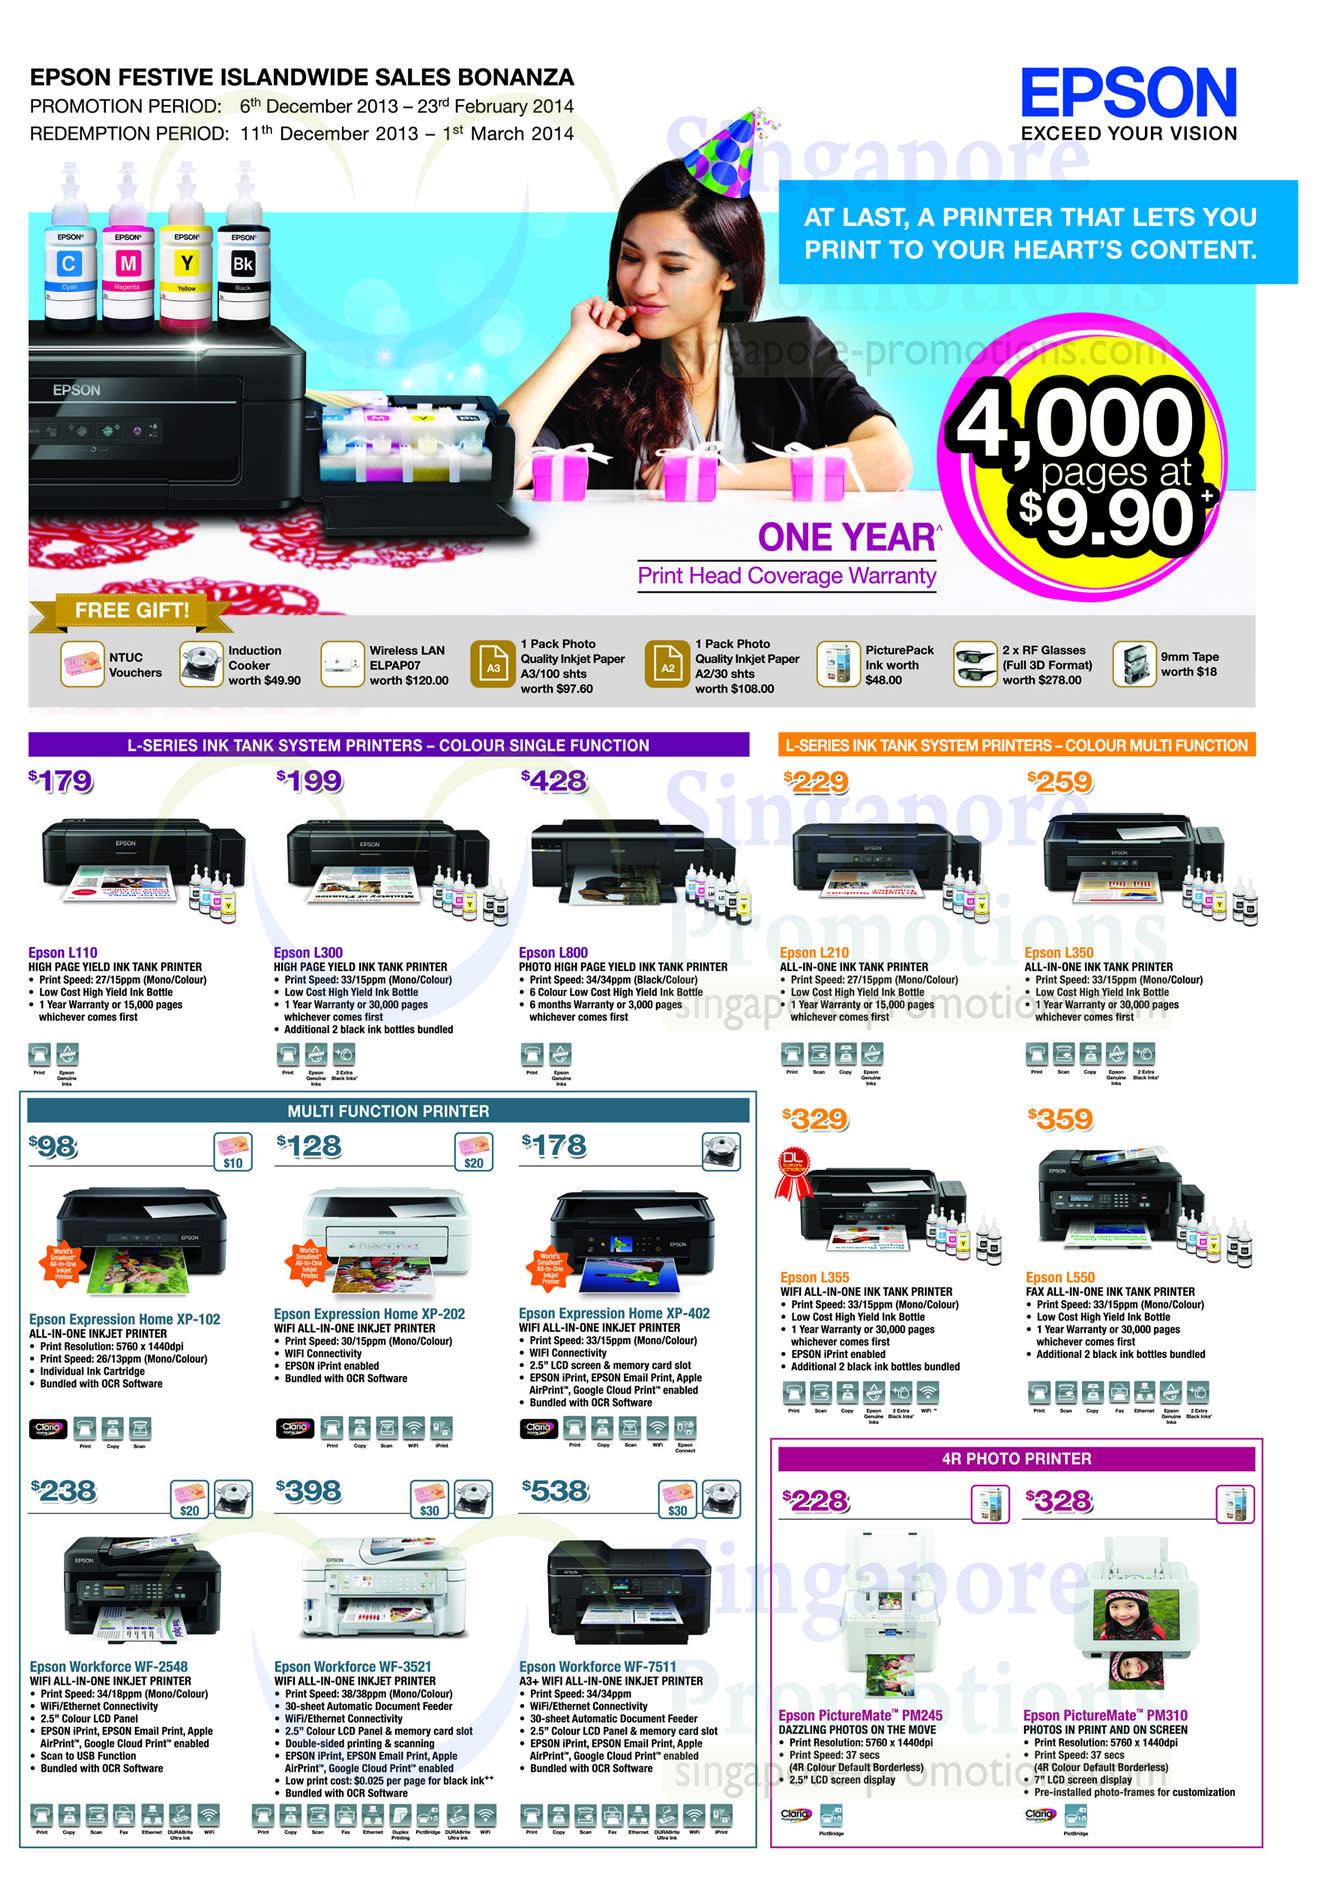 Printers L-Series Ink Tank System, Expression Home, 4R Photo Printer, Workforce